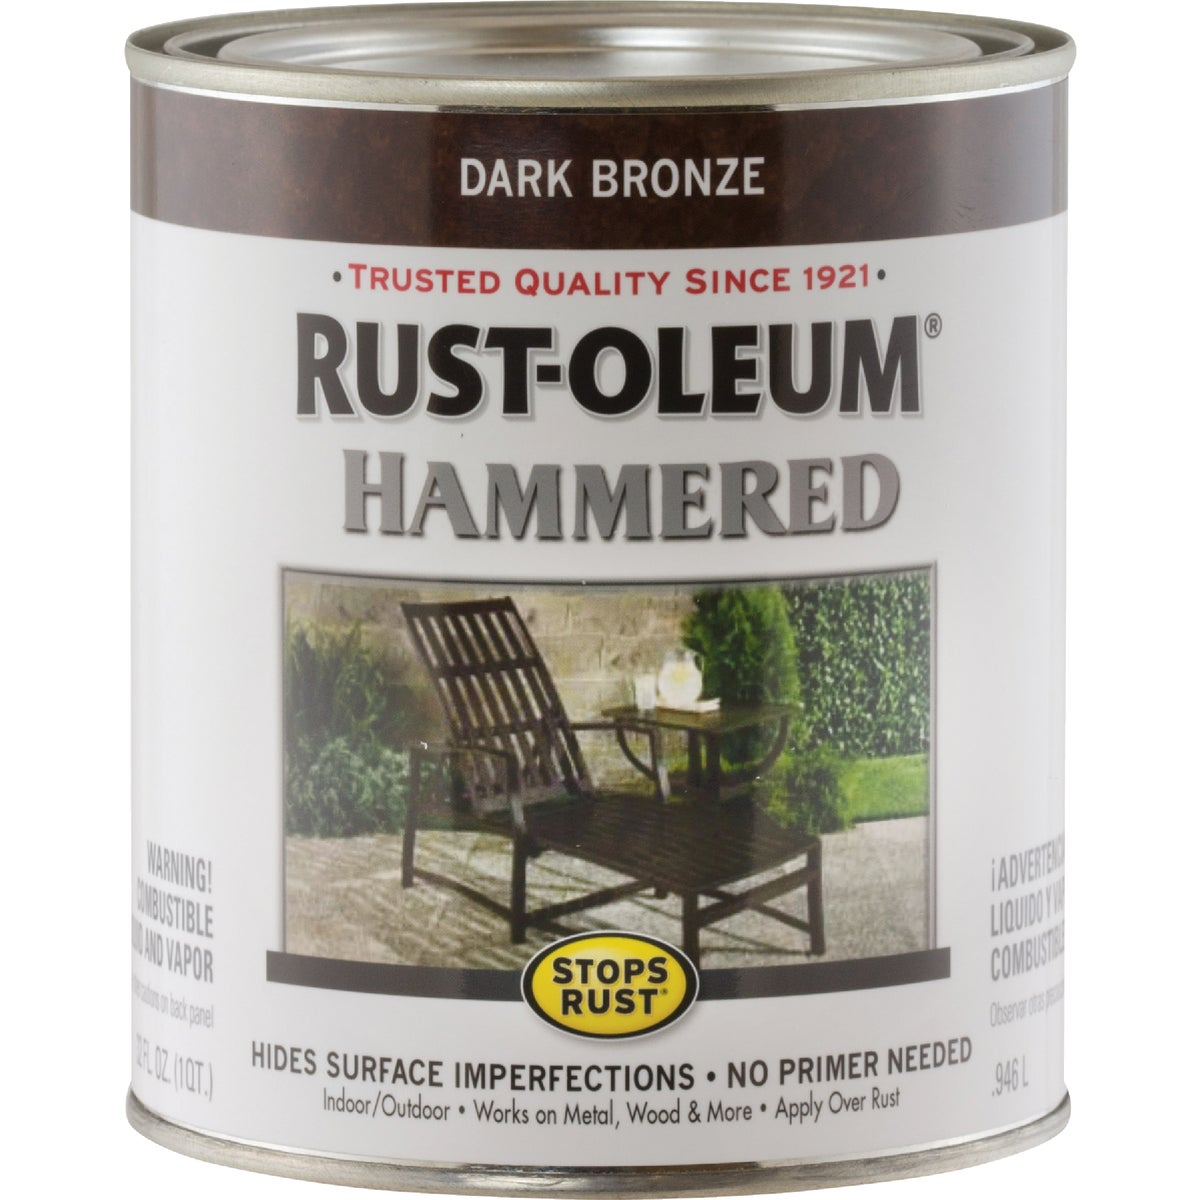 Rust Oleum DK BRONZE HAMMERED PAINT 239075